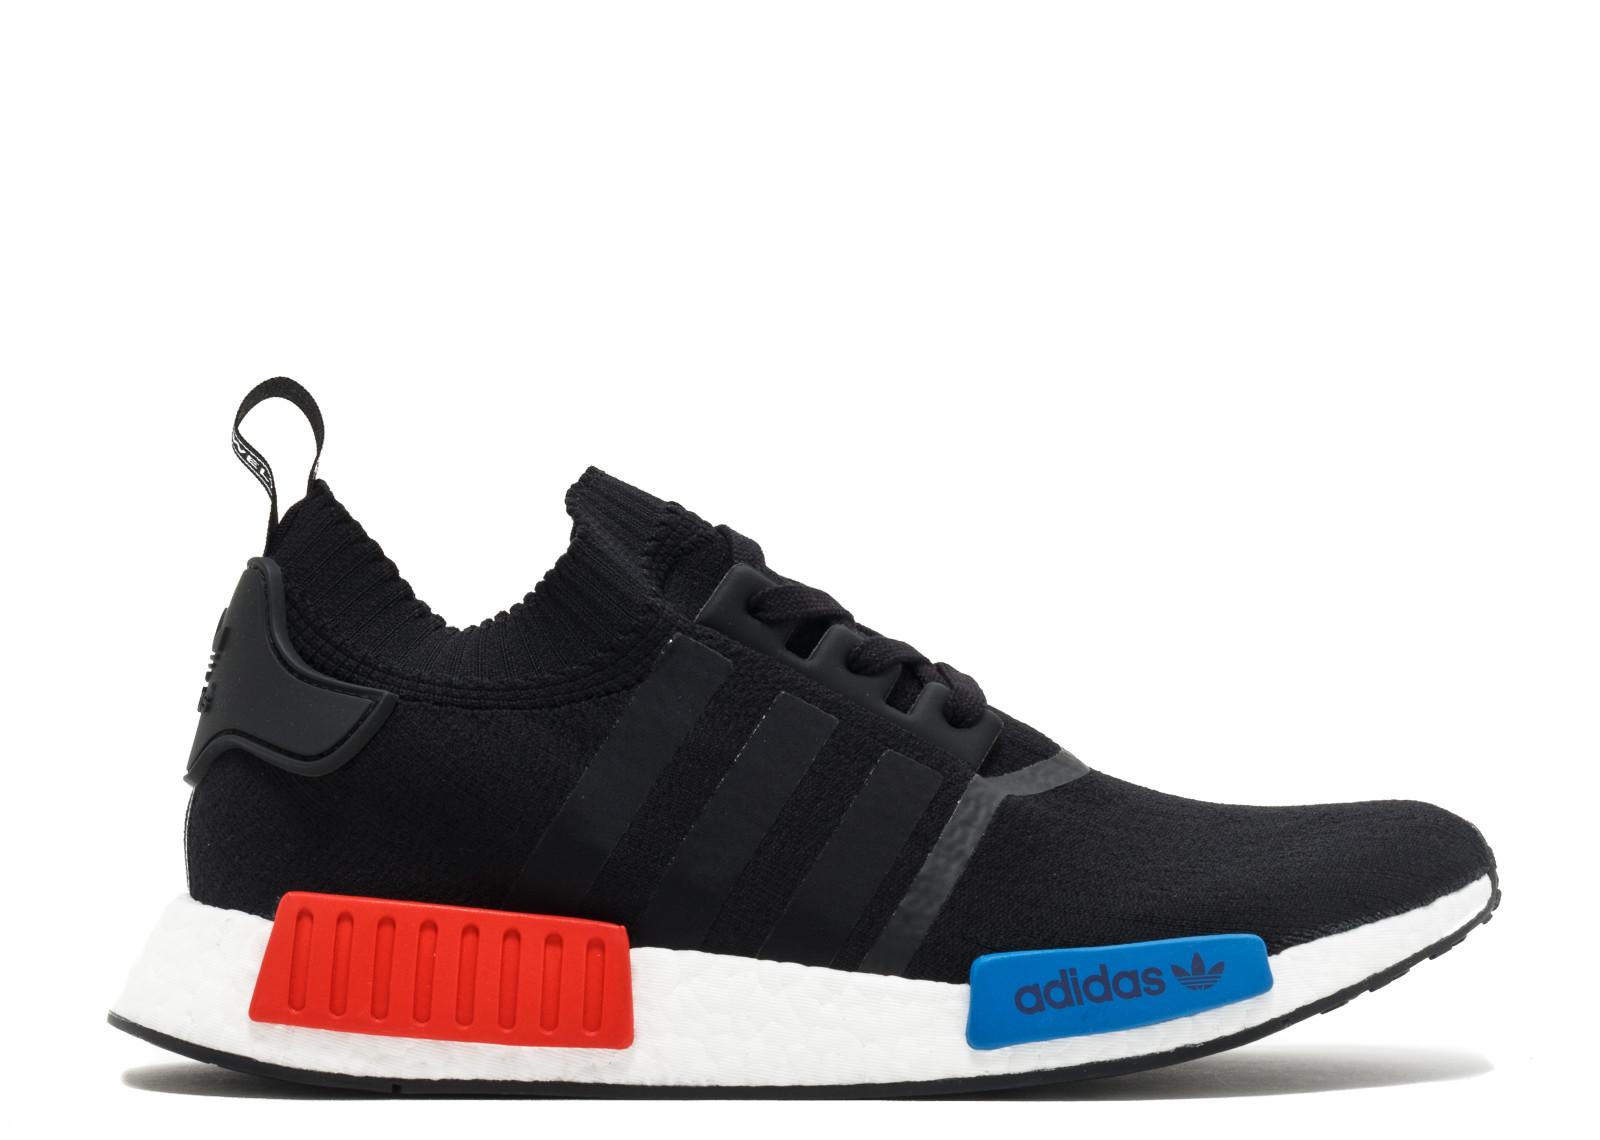 adidas nmd primeknit og black